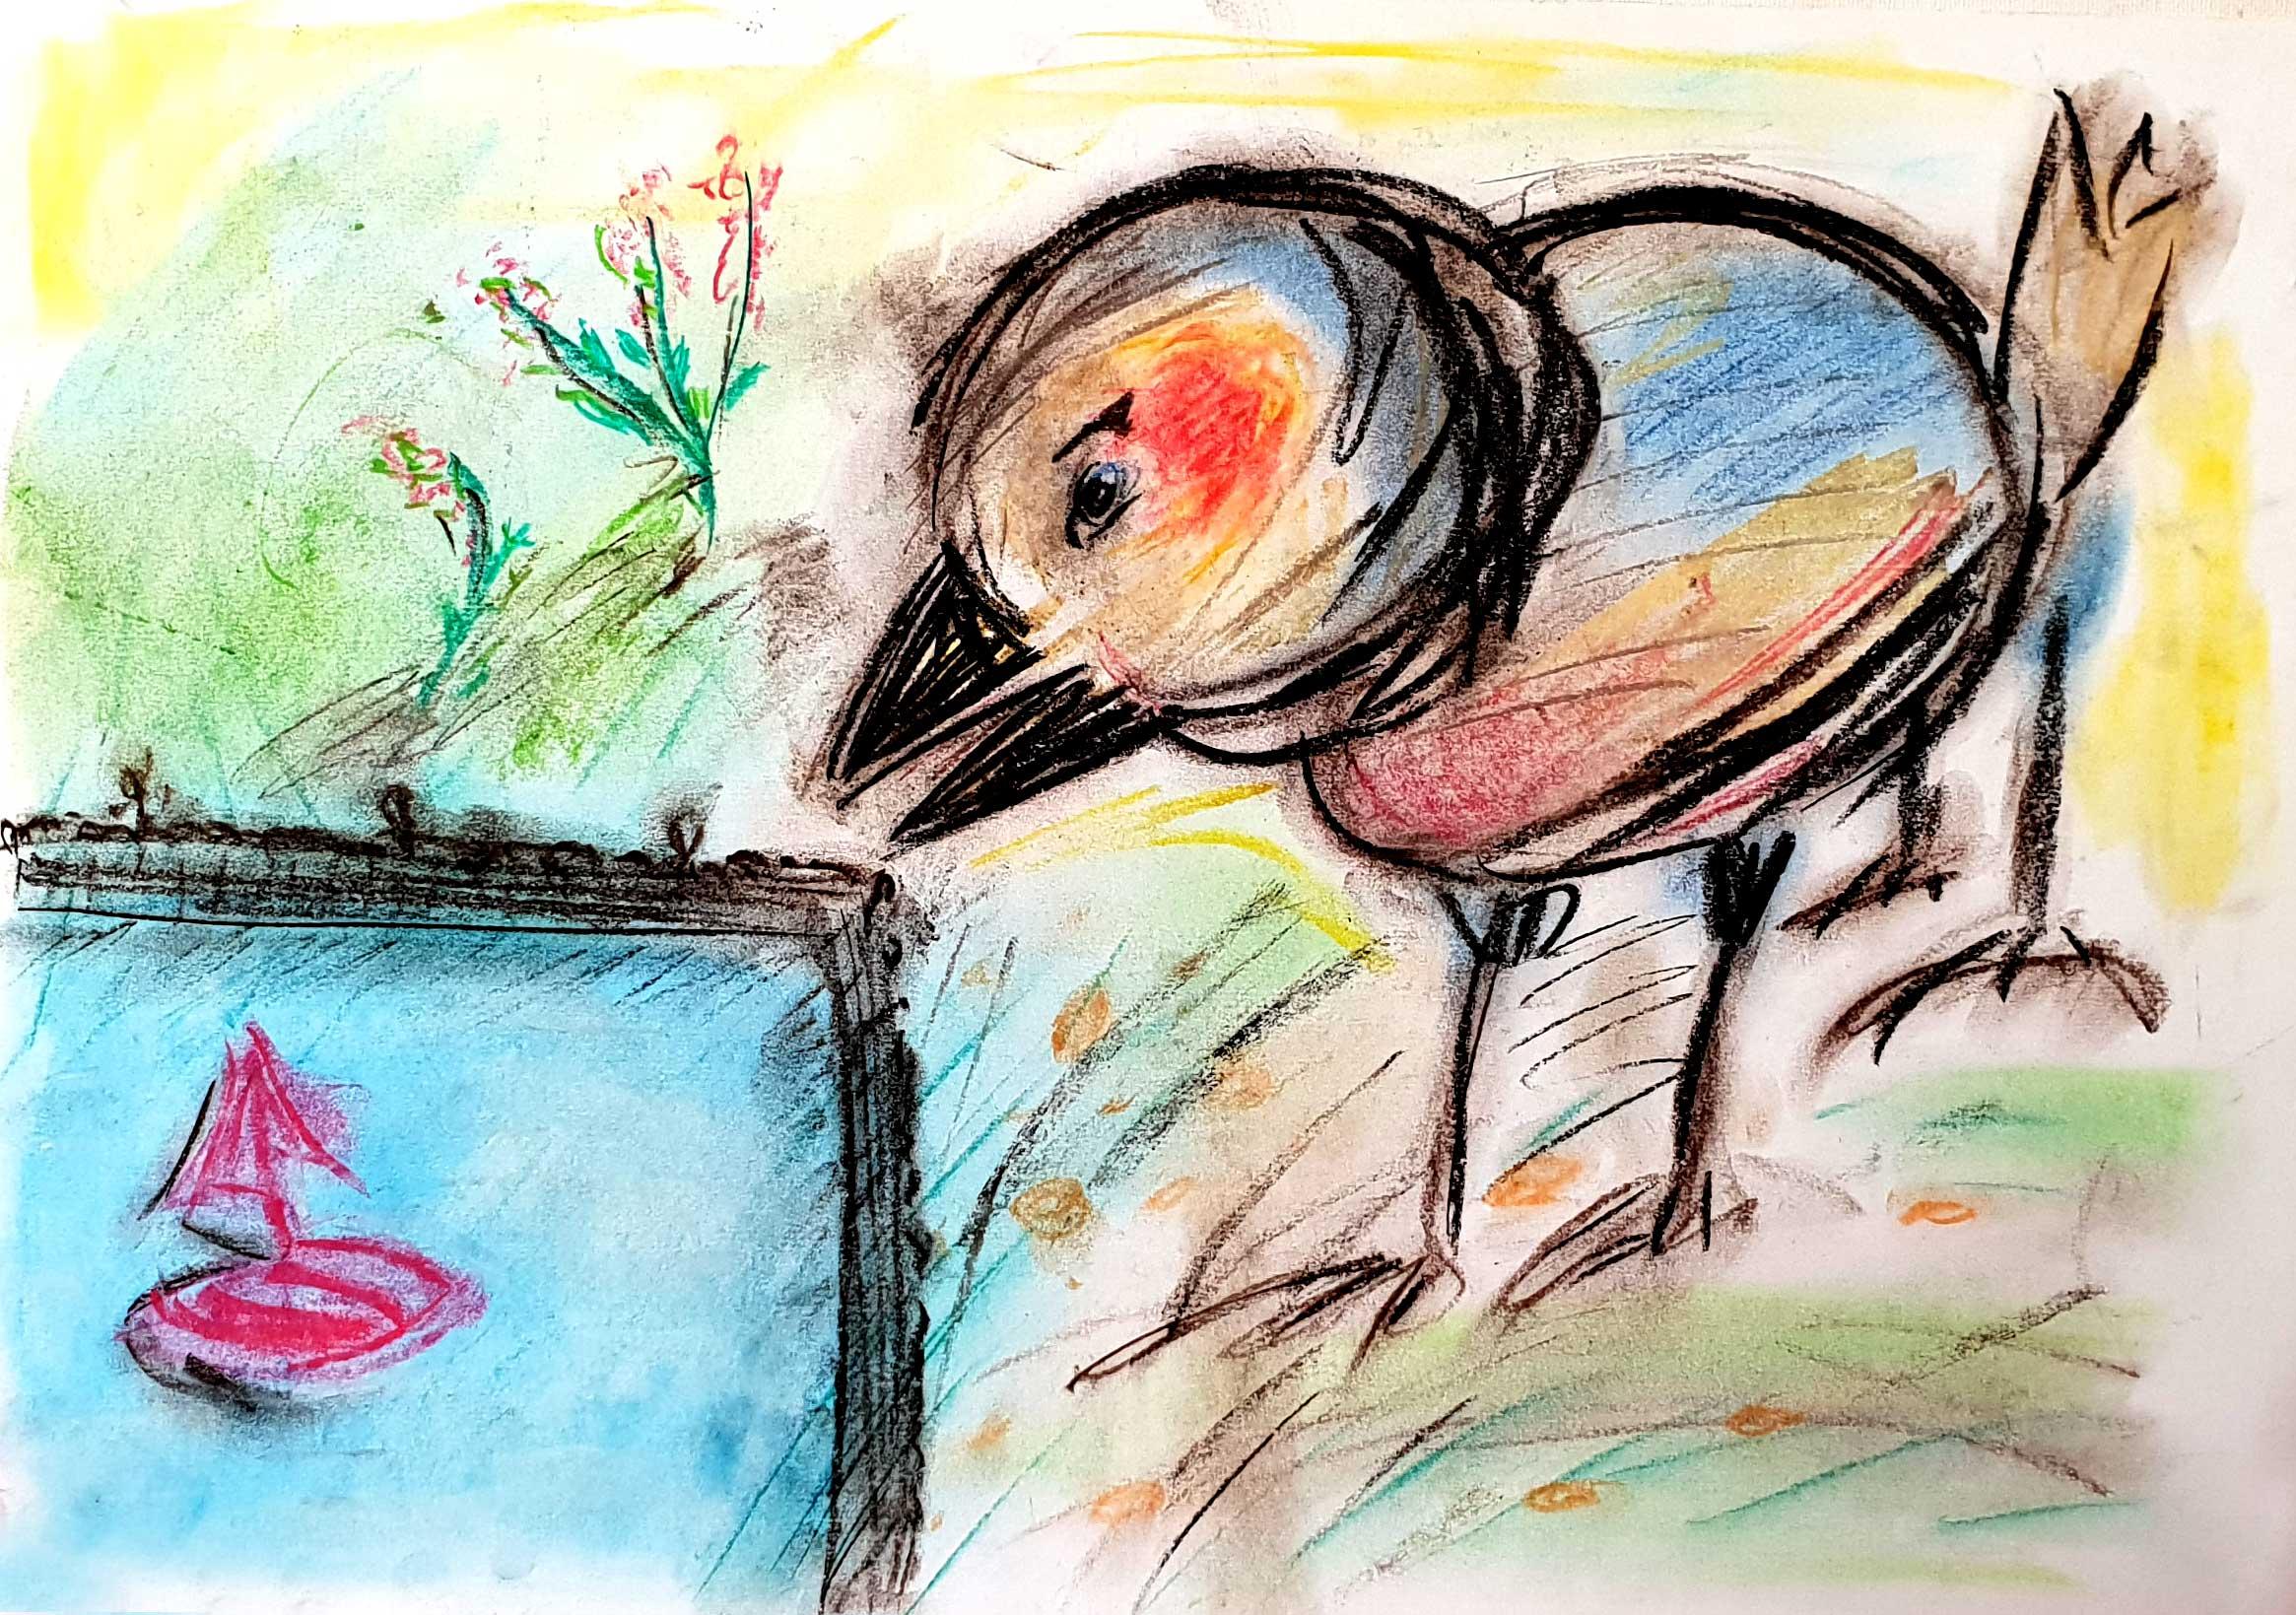 CuriousBird